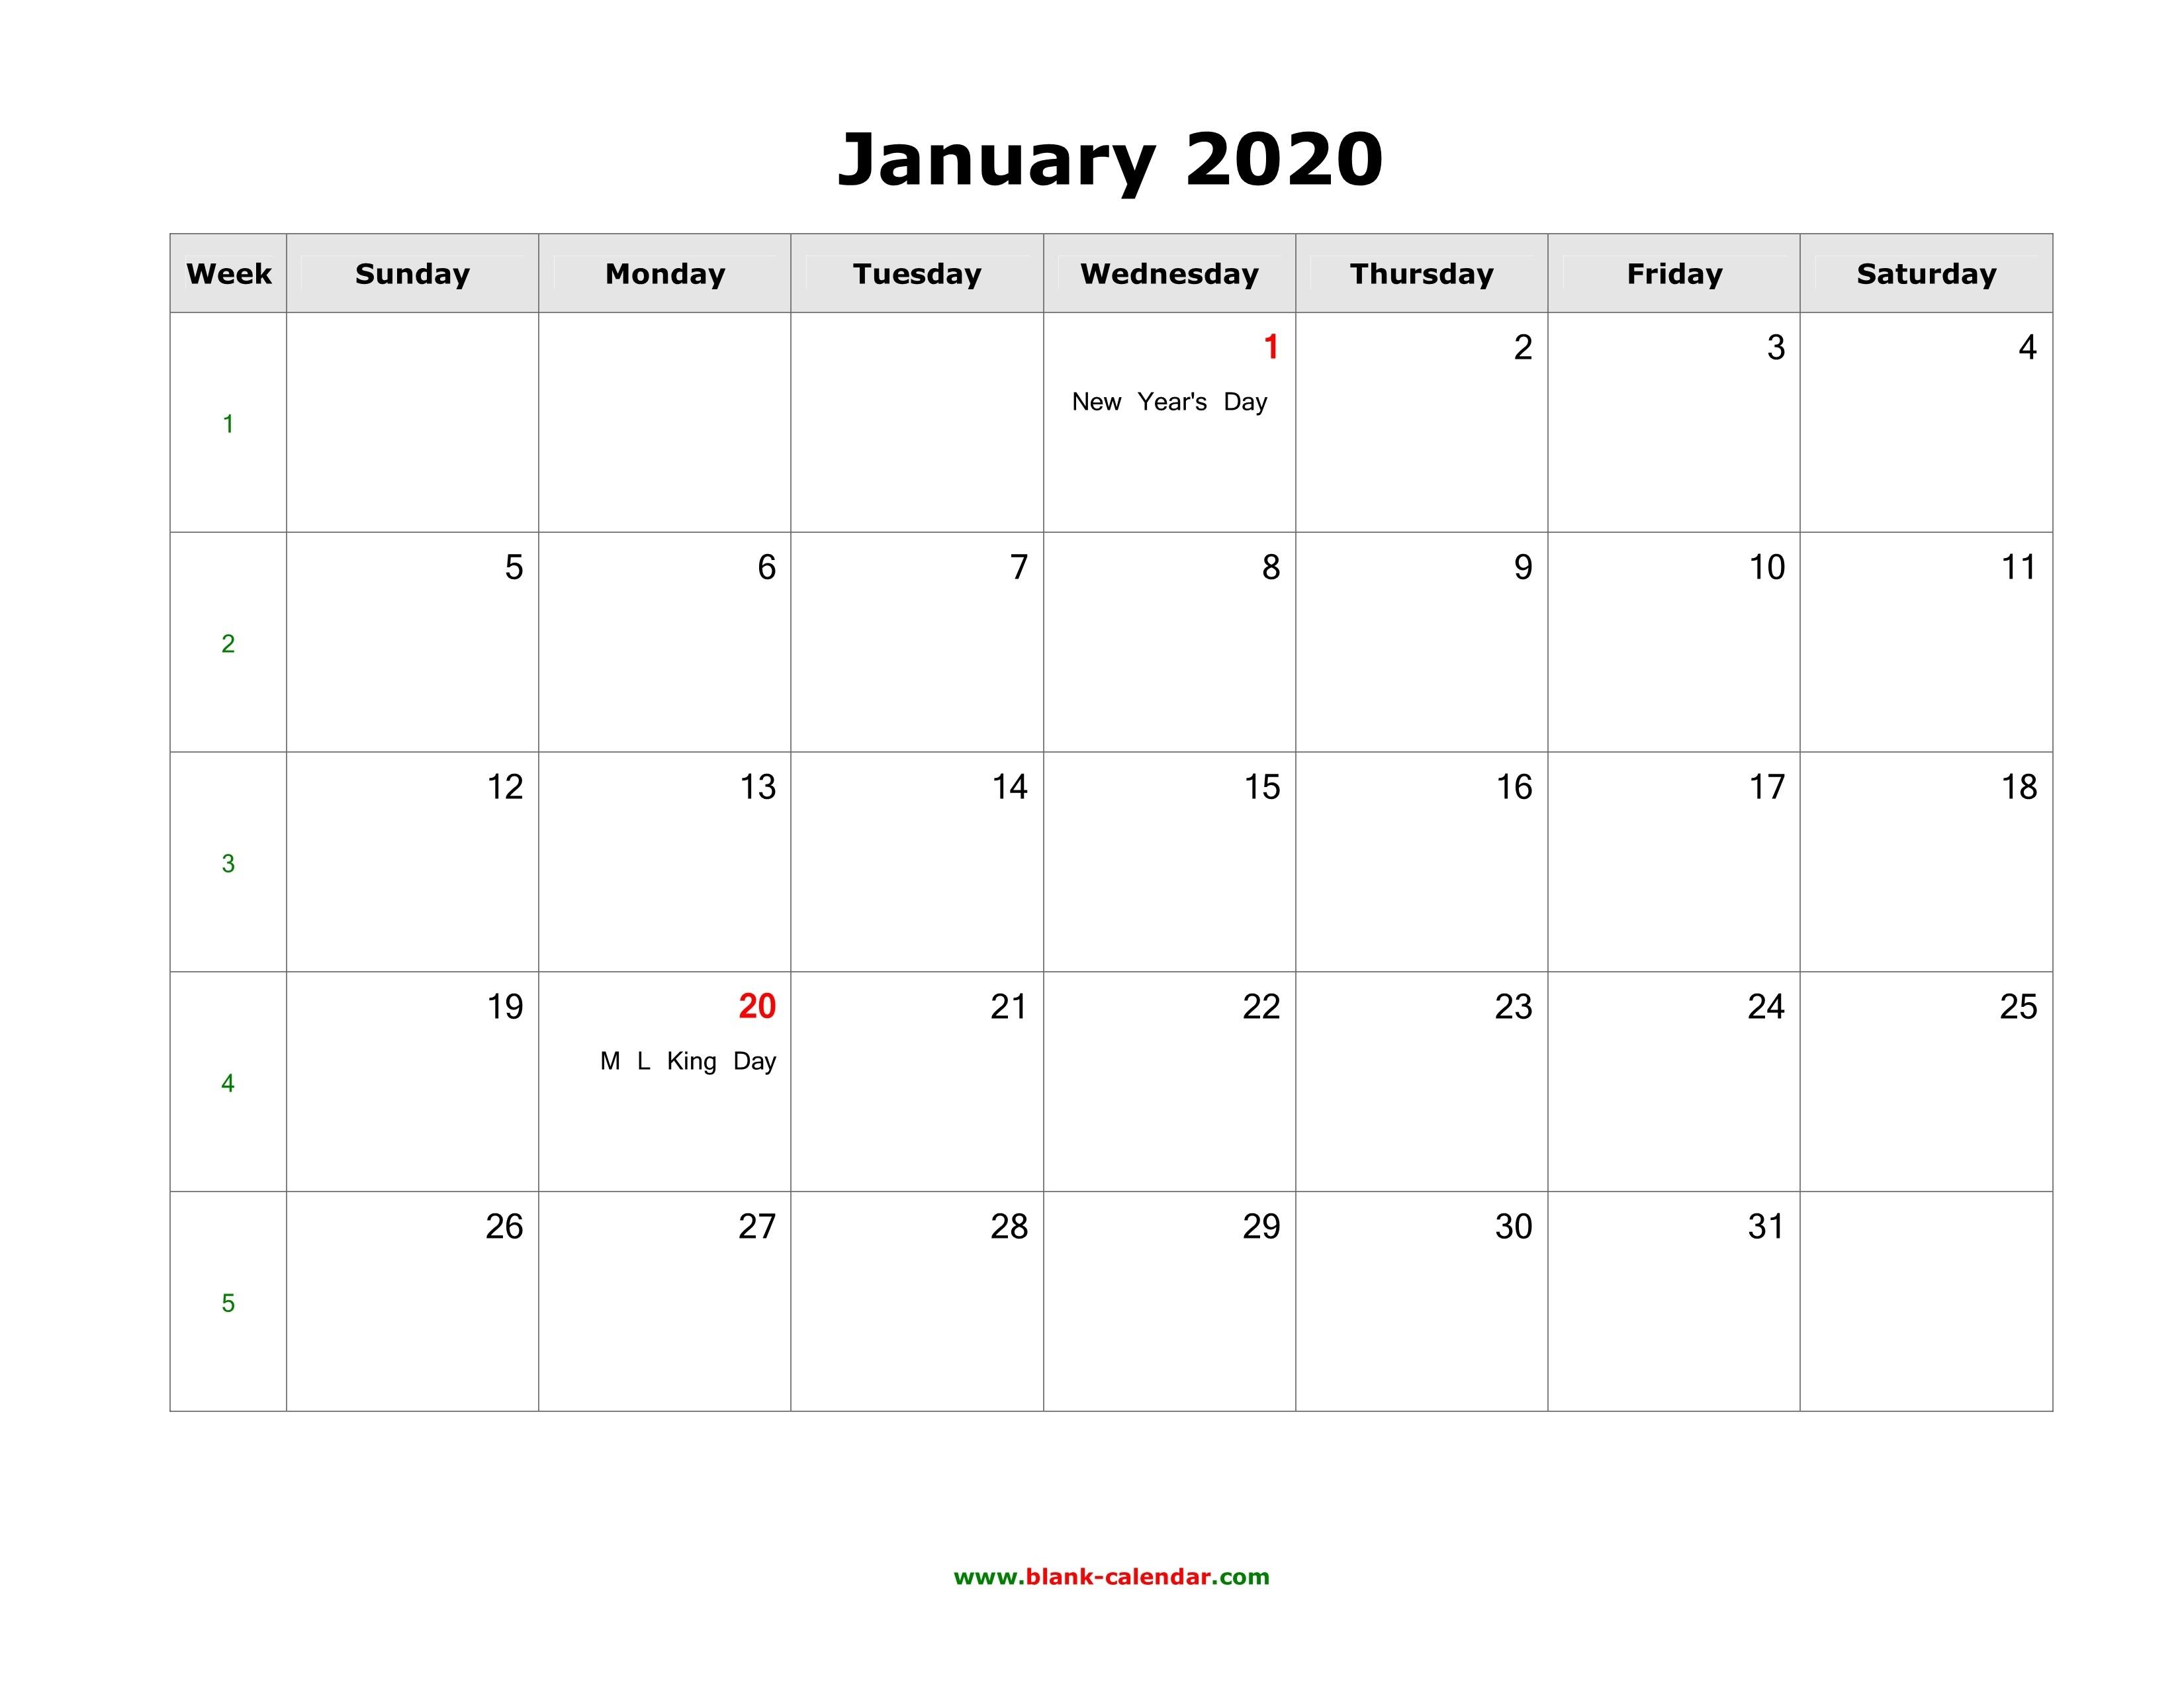 January 2020 Blank Calendar | Free Download Calendar Templates-January 2020 Calendar Xl